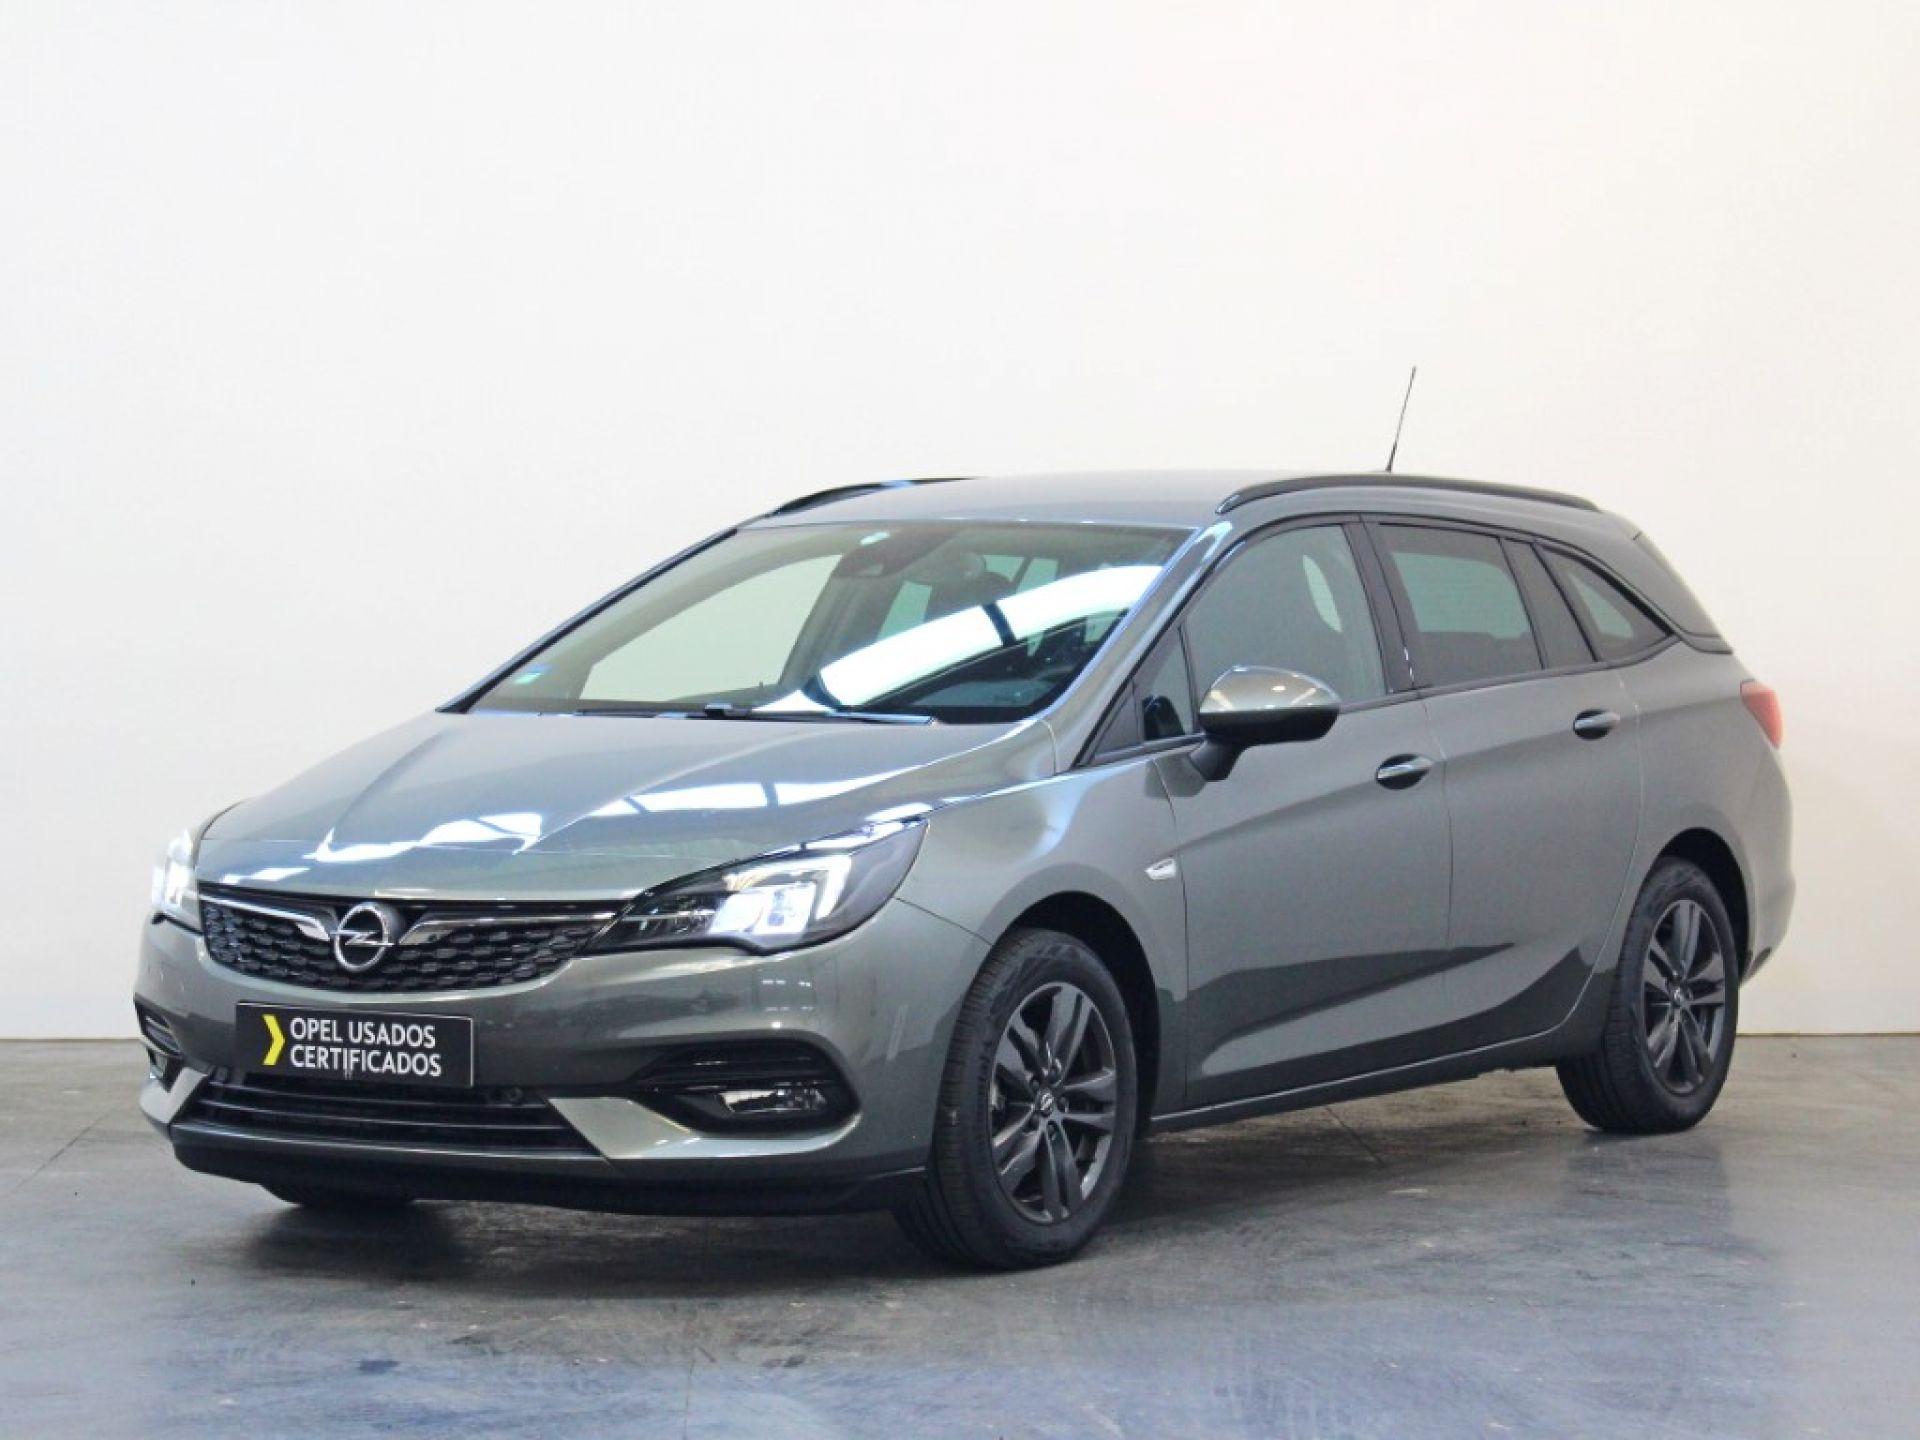 Opel Astra 1.5 Turbo D 122cv GLine ST usada Porto